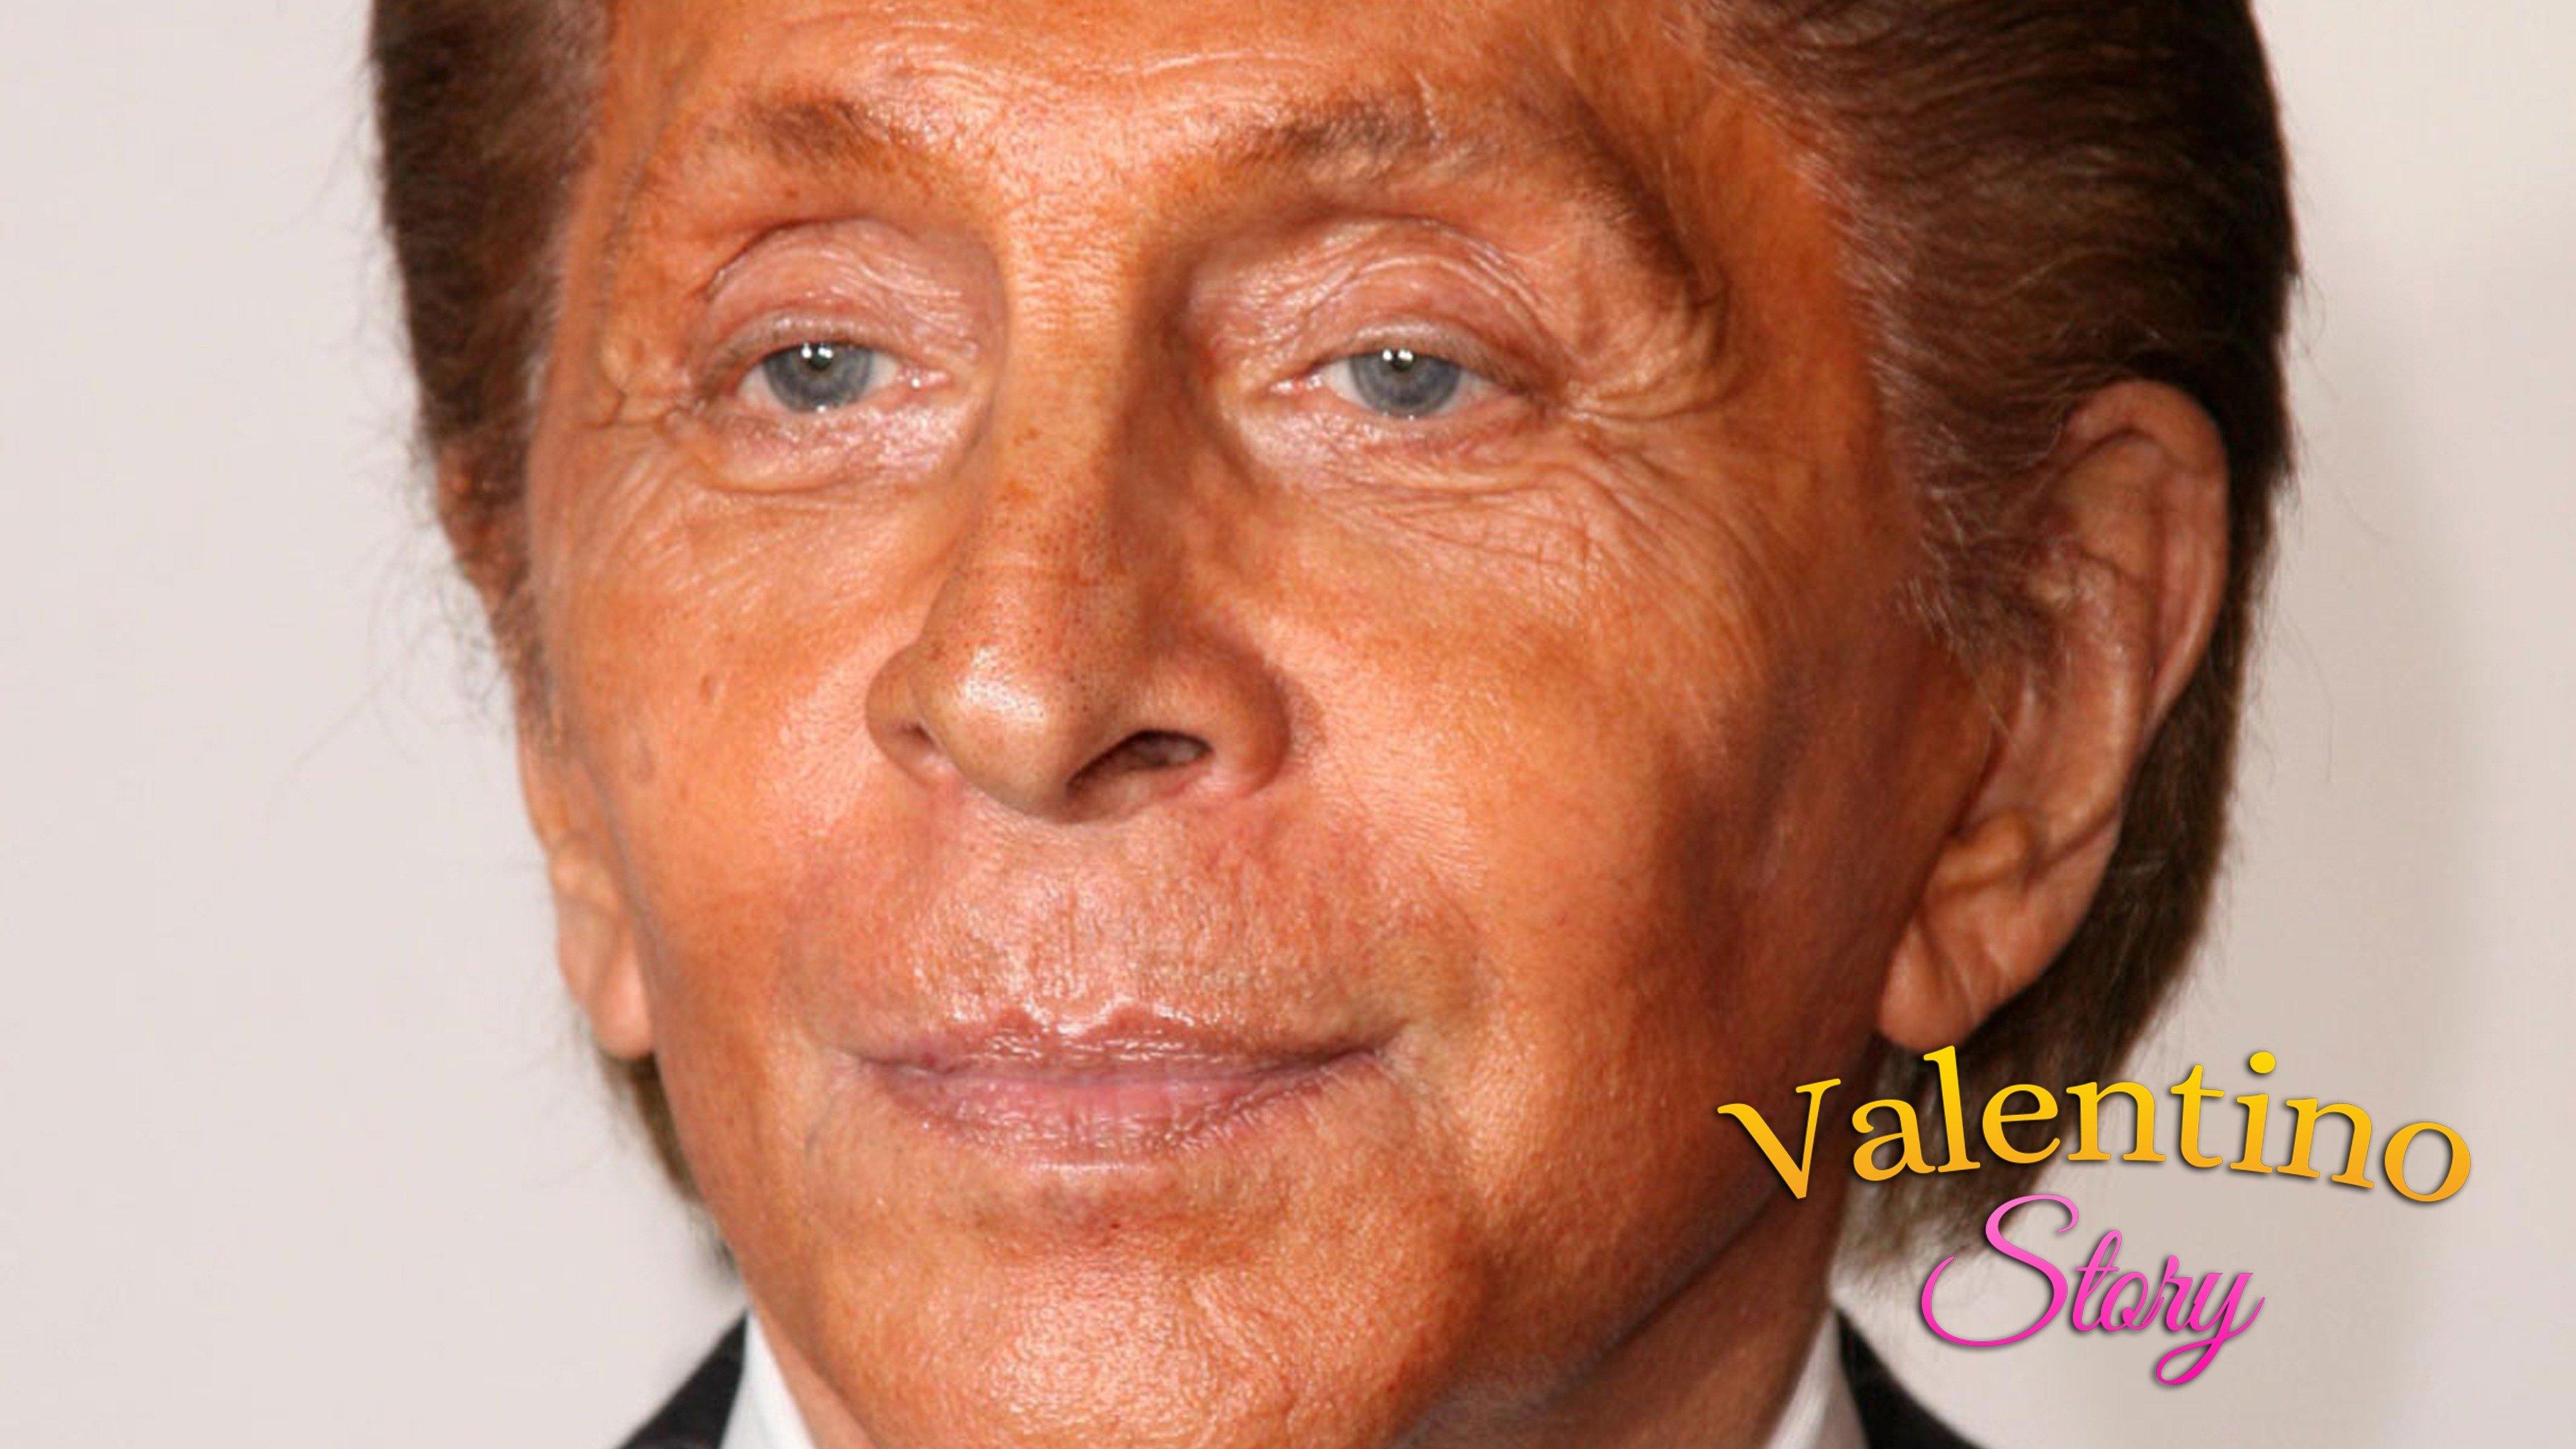 Valentino Story